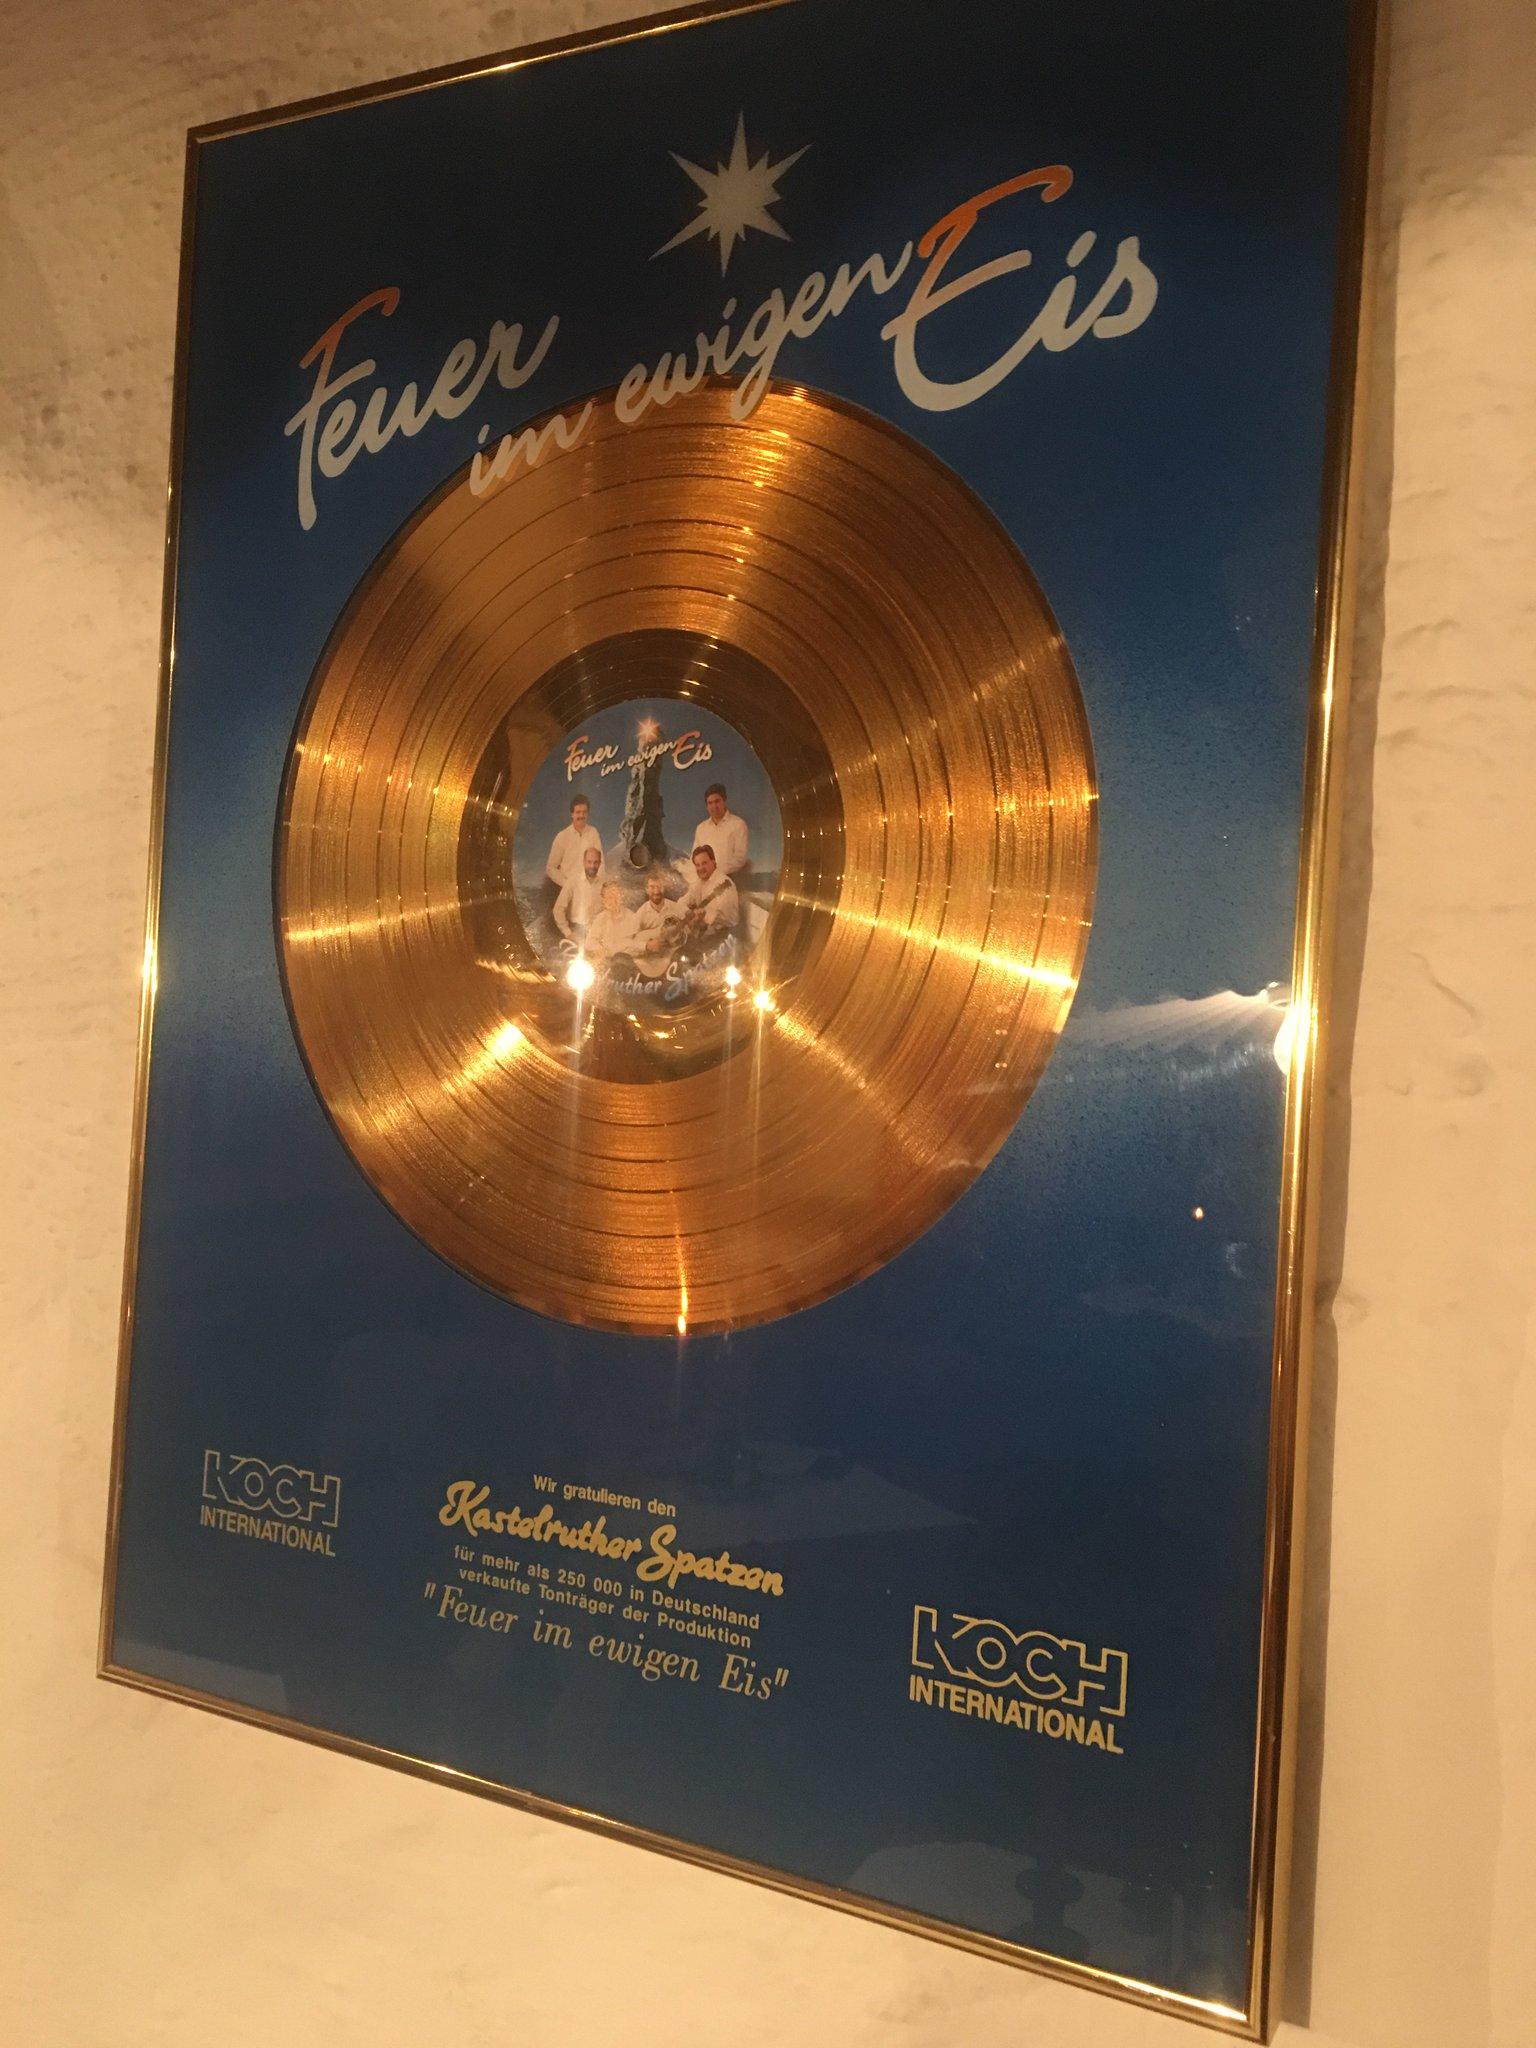 In Kastelruth hängen Goldene Schallplatten im Restaurant 😀 #meurers #südtirol https://t.co/alFY8J5rOn